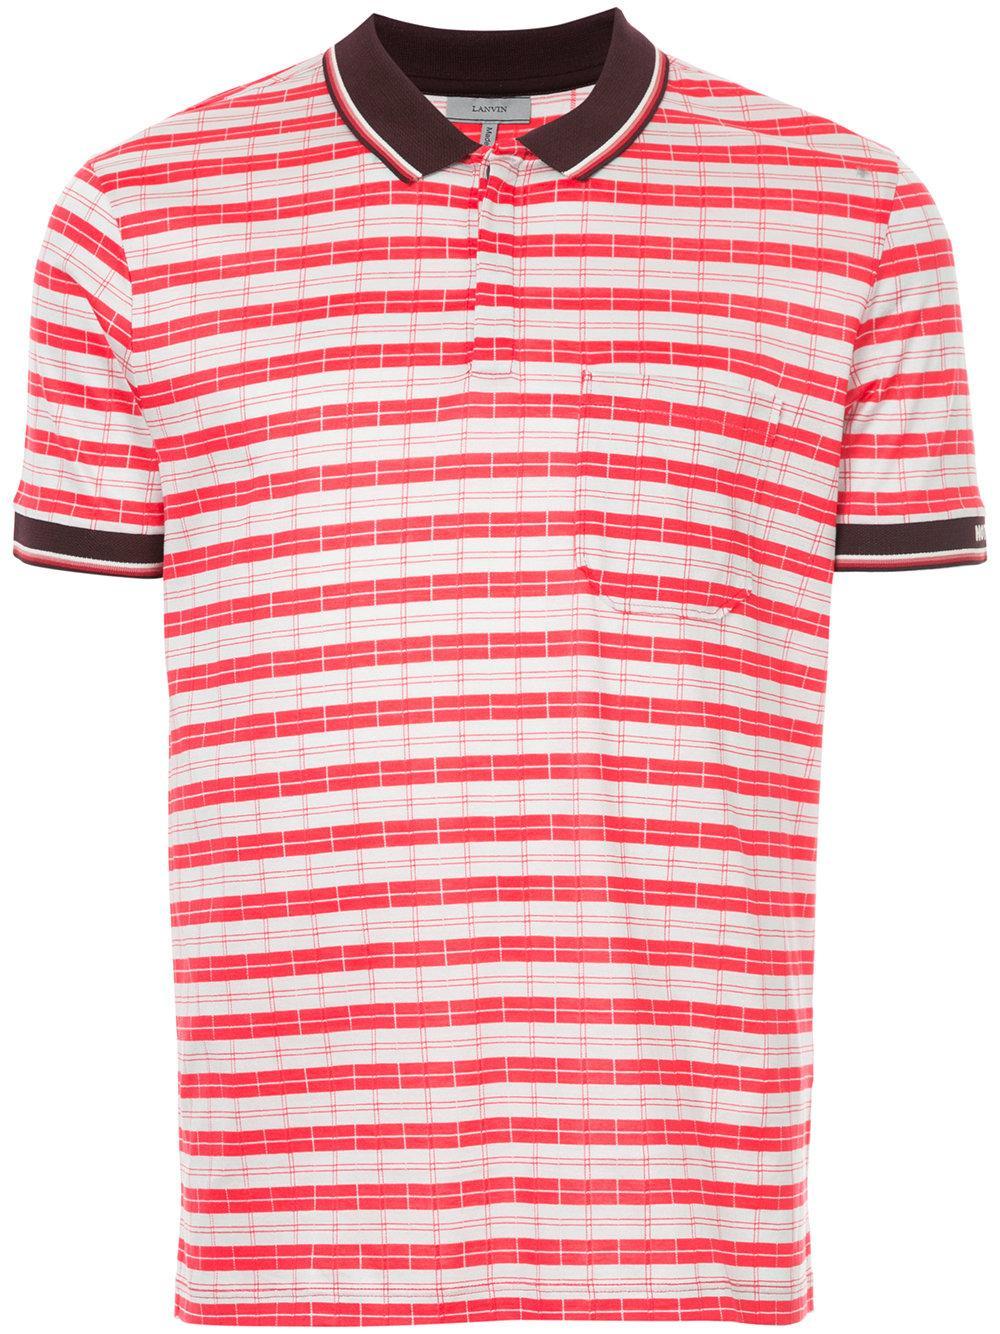 Lanvin Casual Striped Polo Shirt